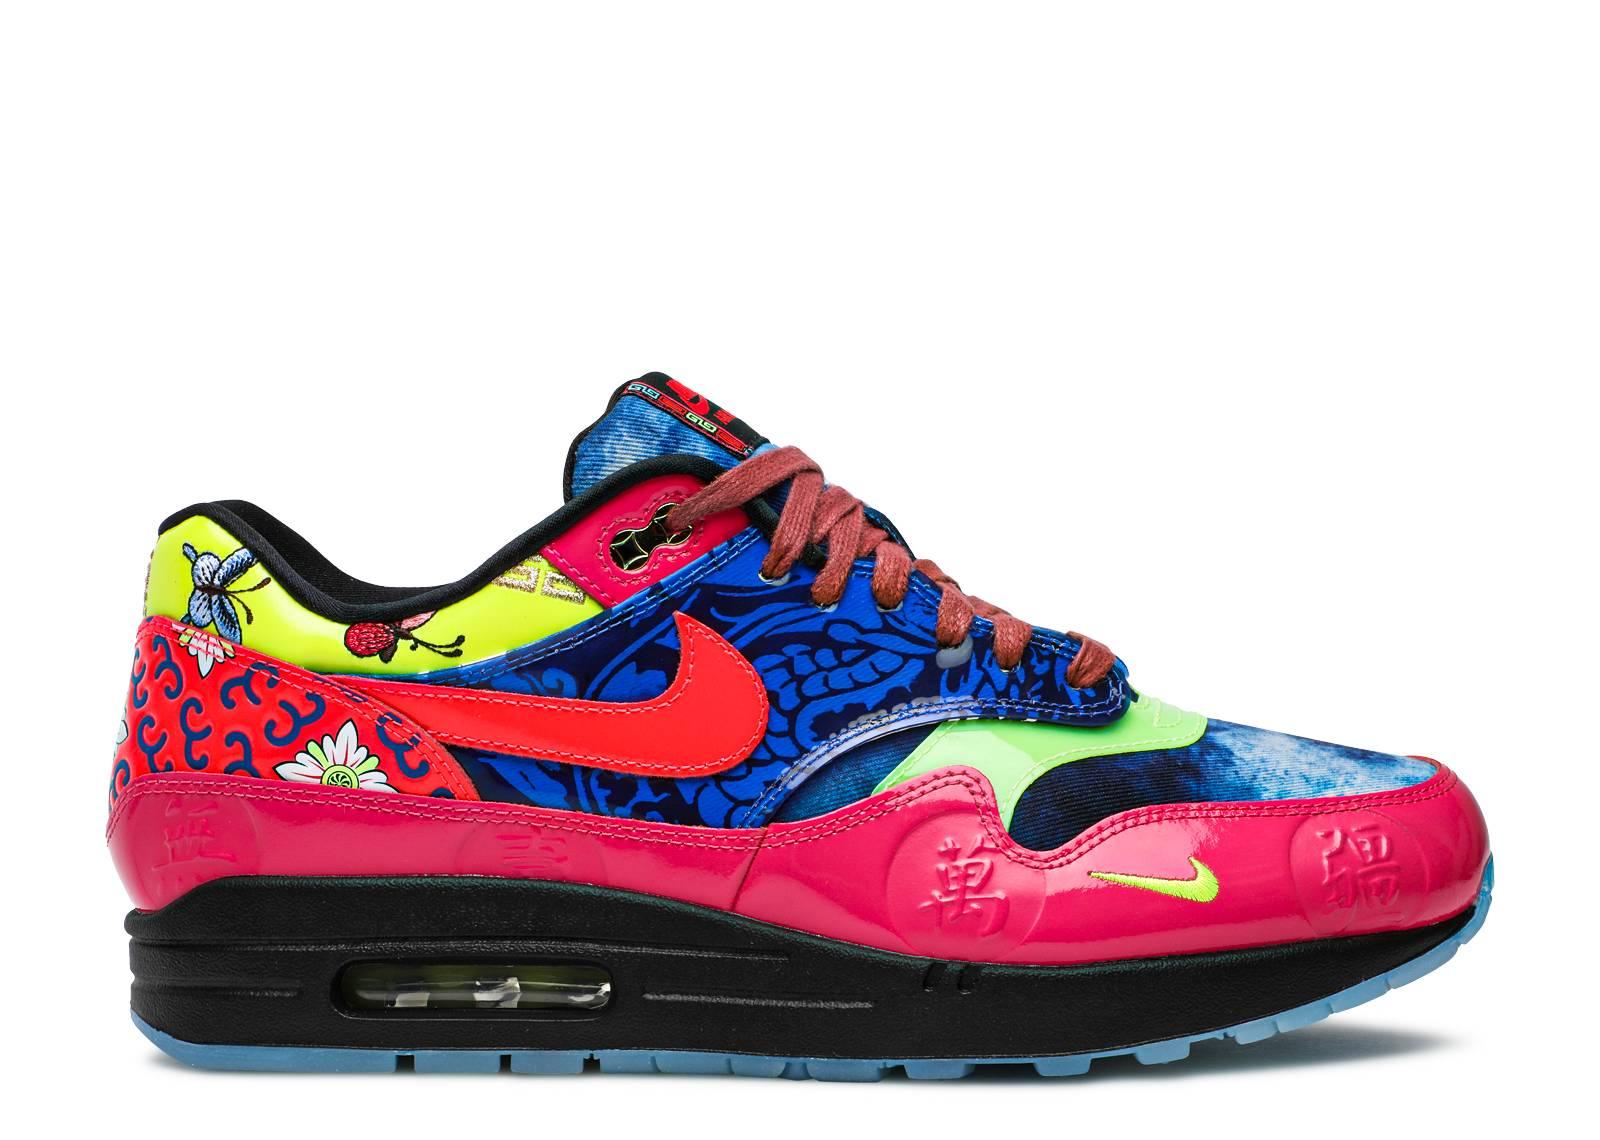 Nike Air Max 1 Sneakers | Flight Club